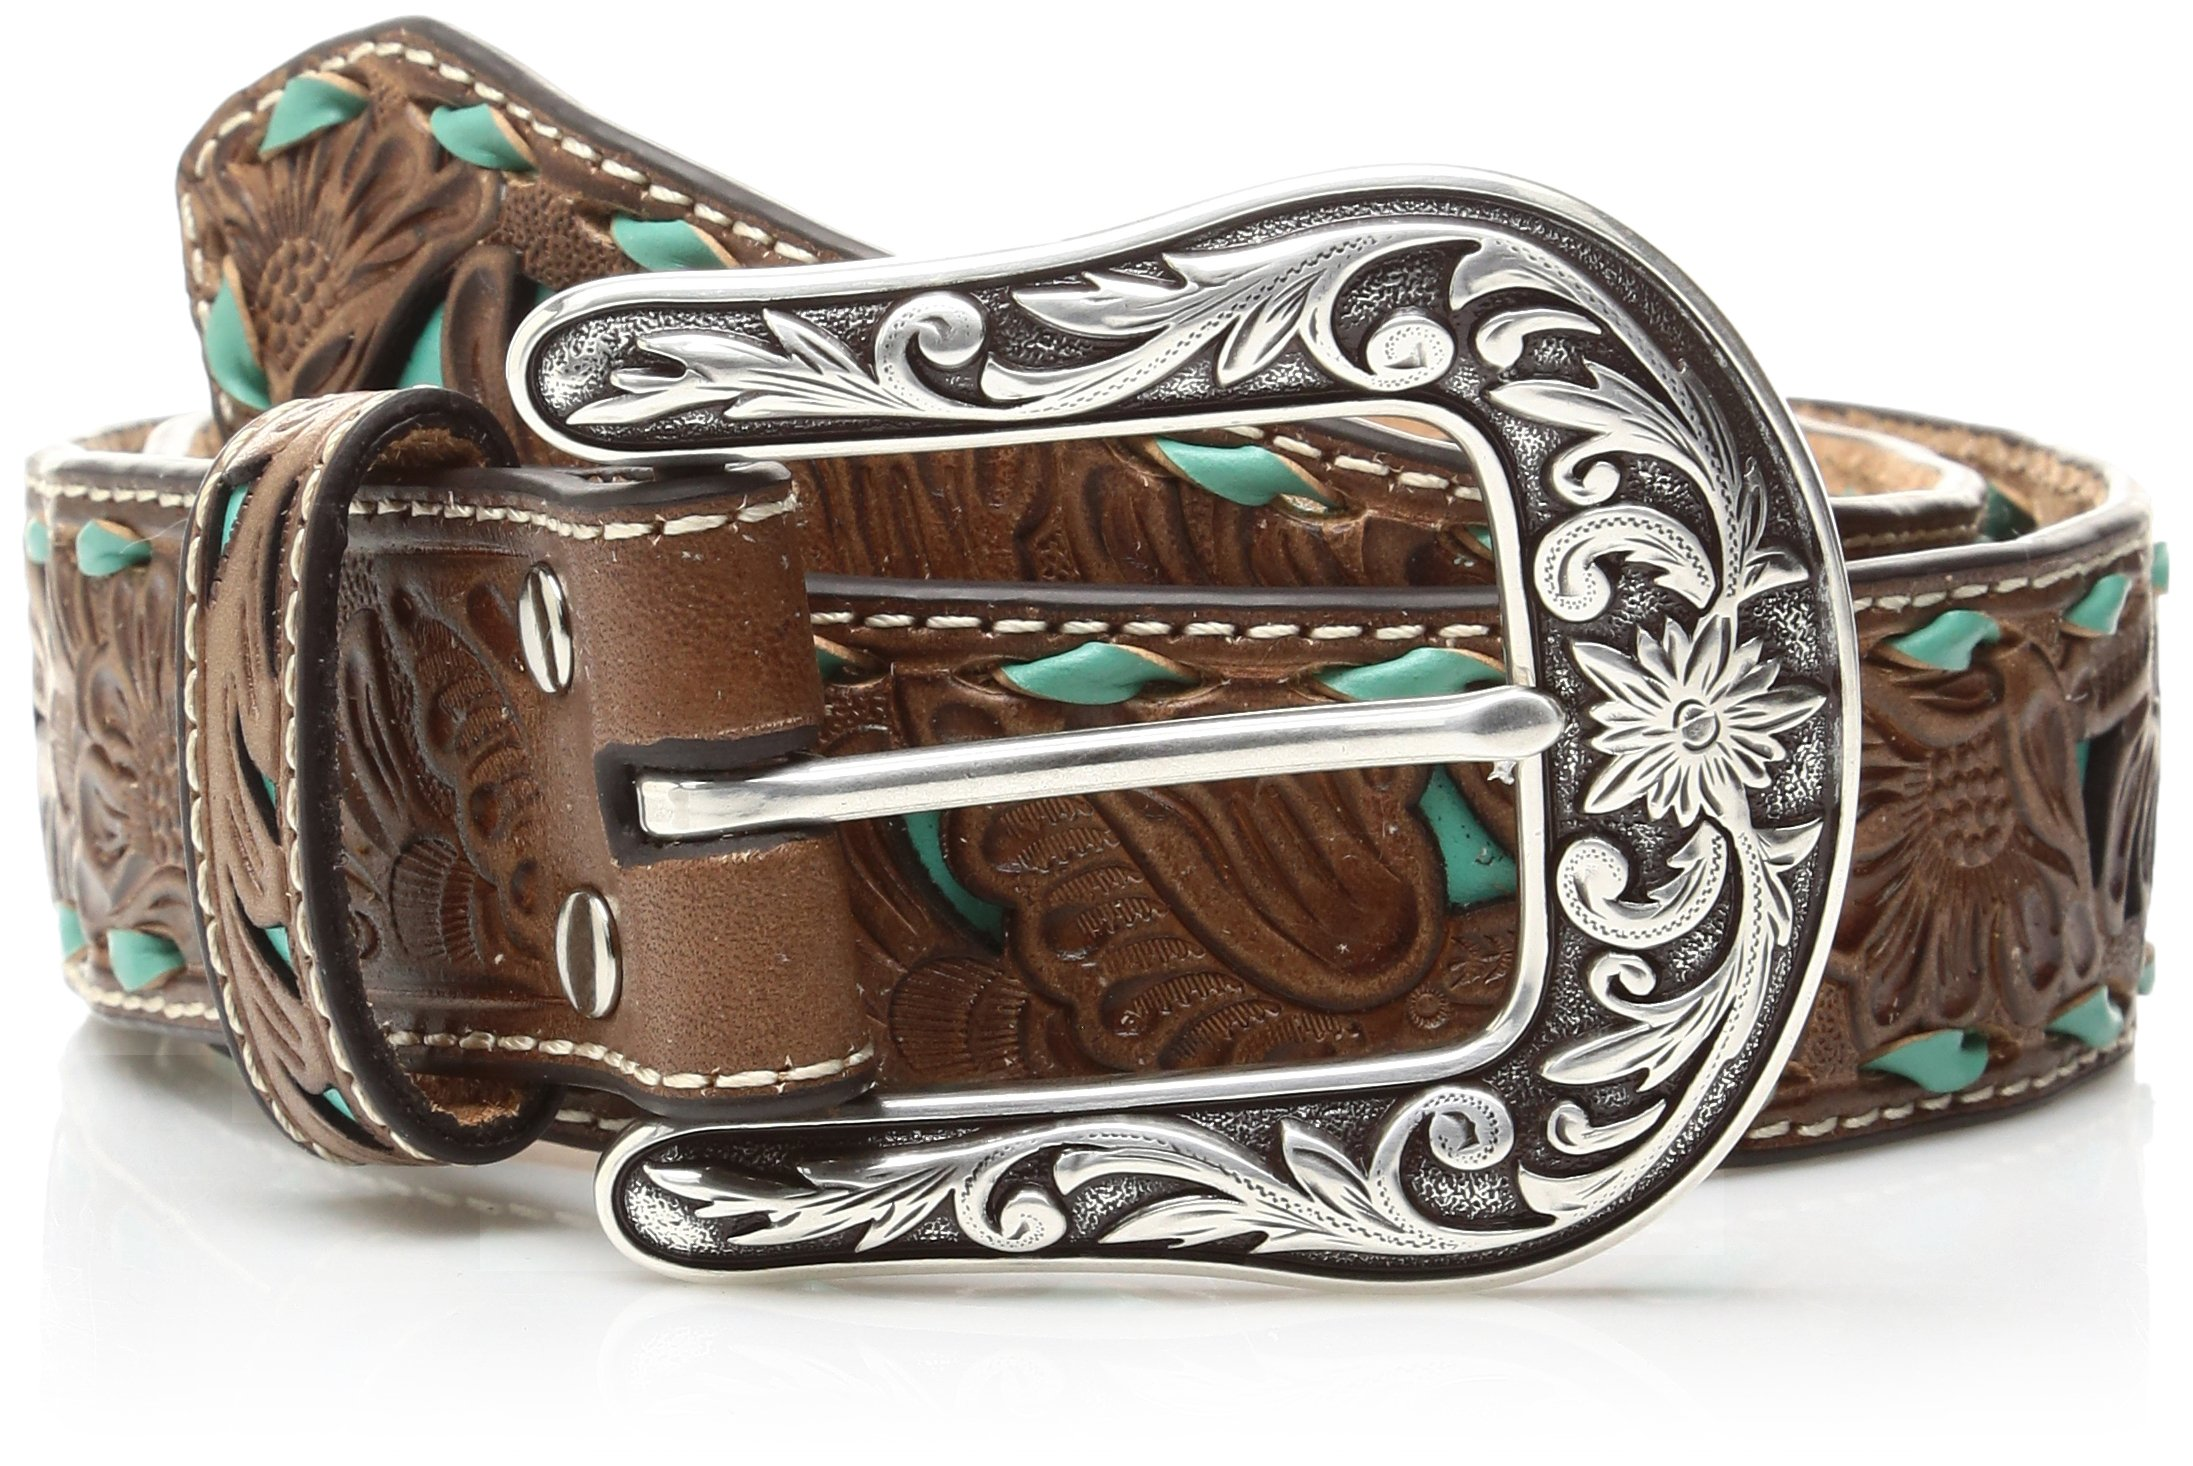 Nocona Belt Co. Women's Turquoise Inlay Buck Belt, brown, Small